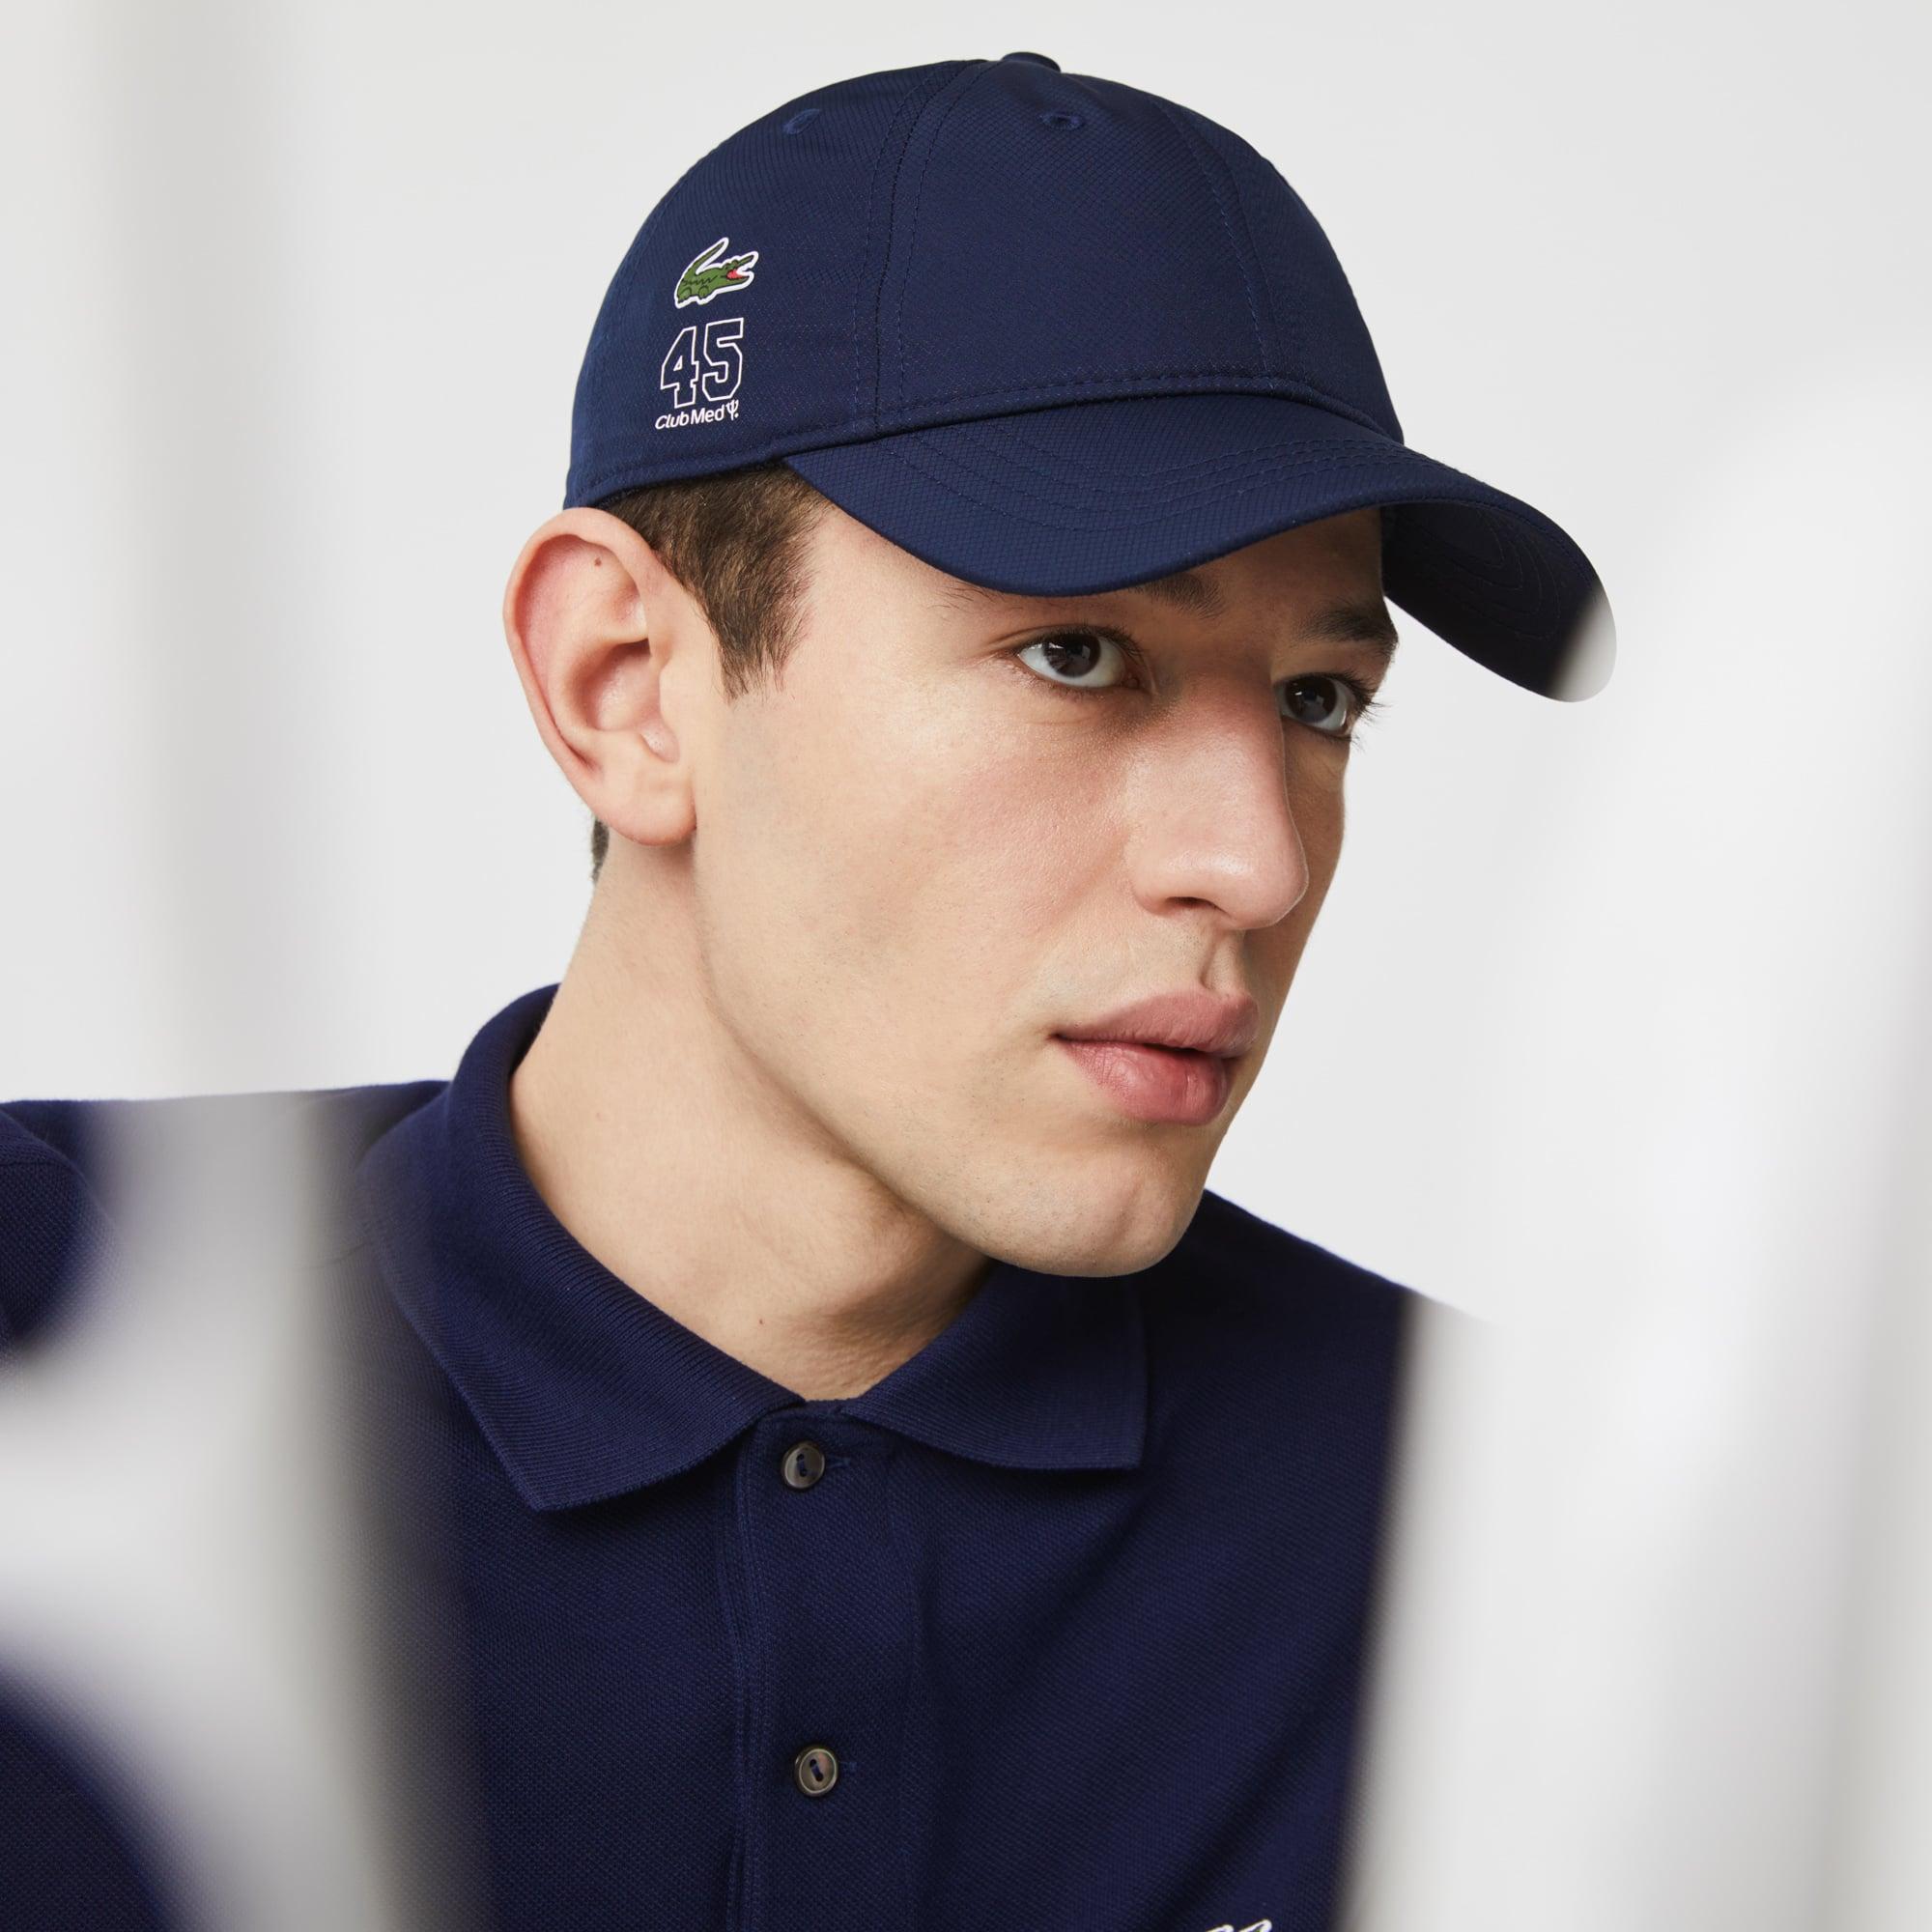 Gorras y sombreros  bfc52056faf